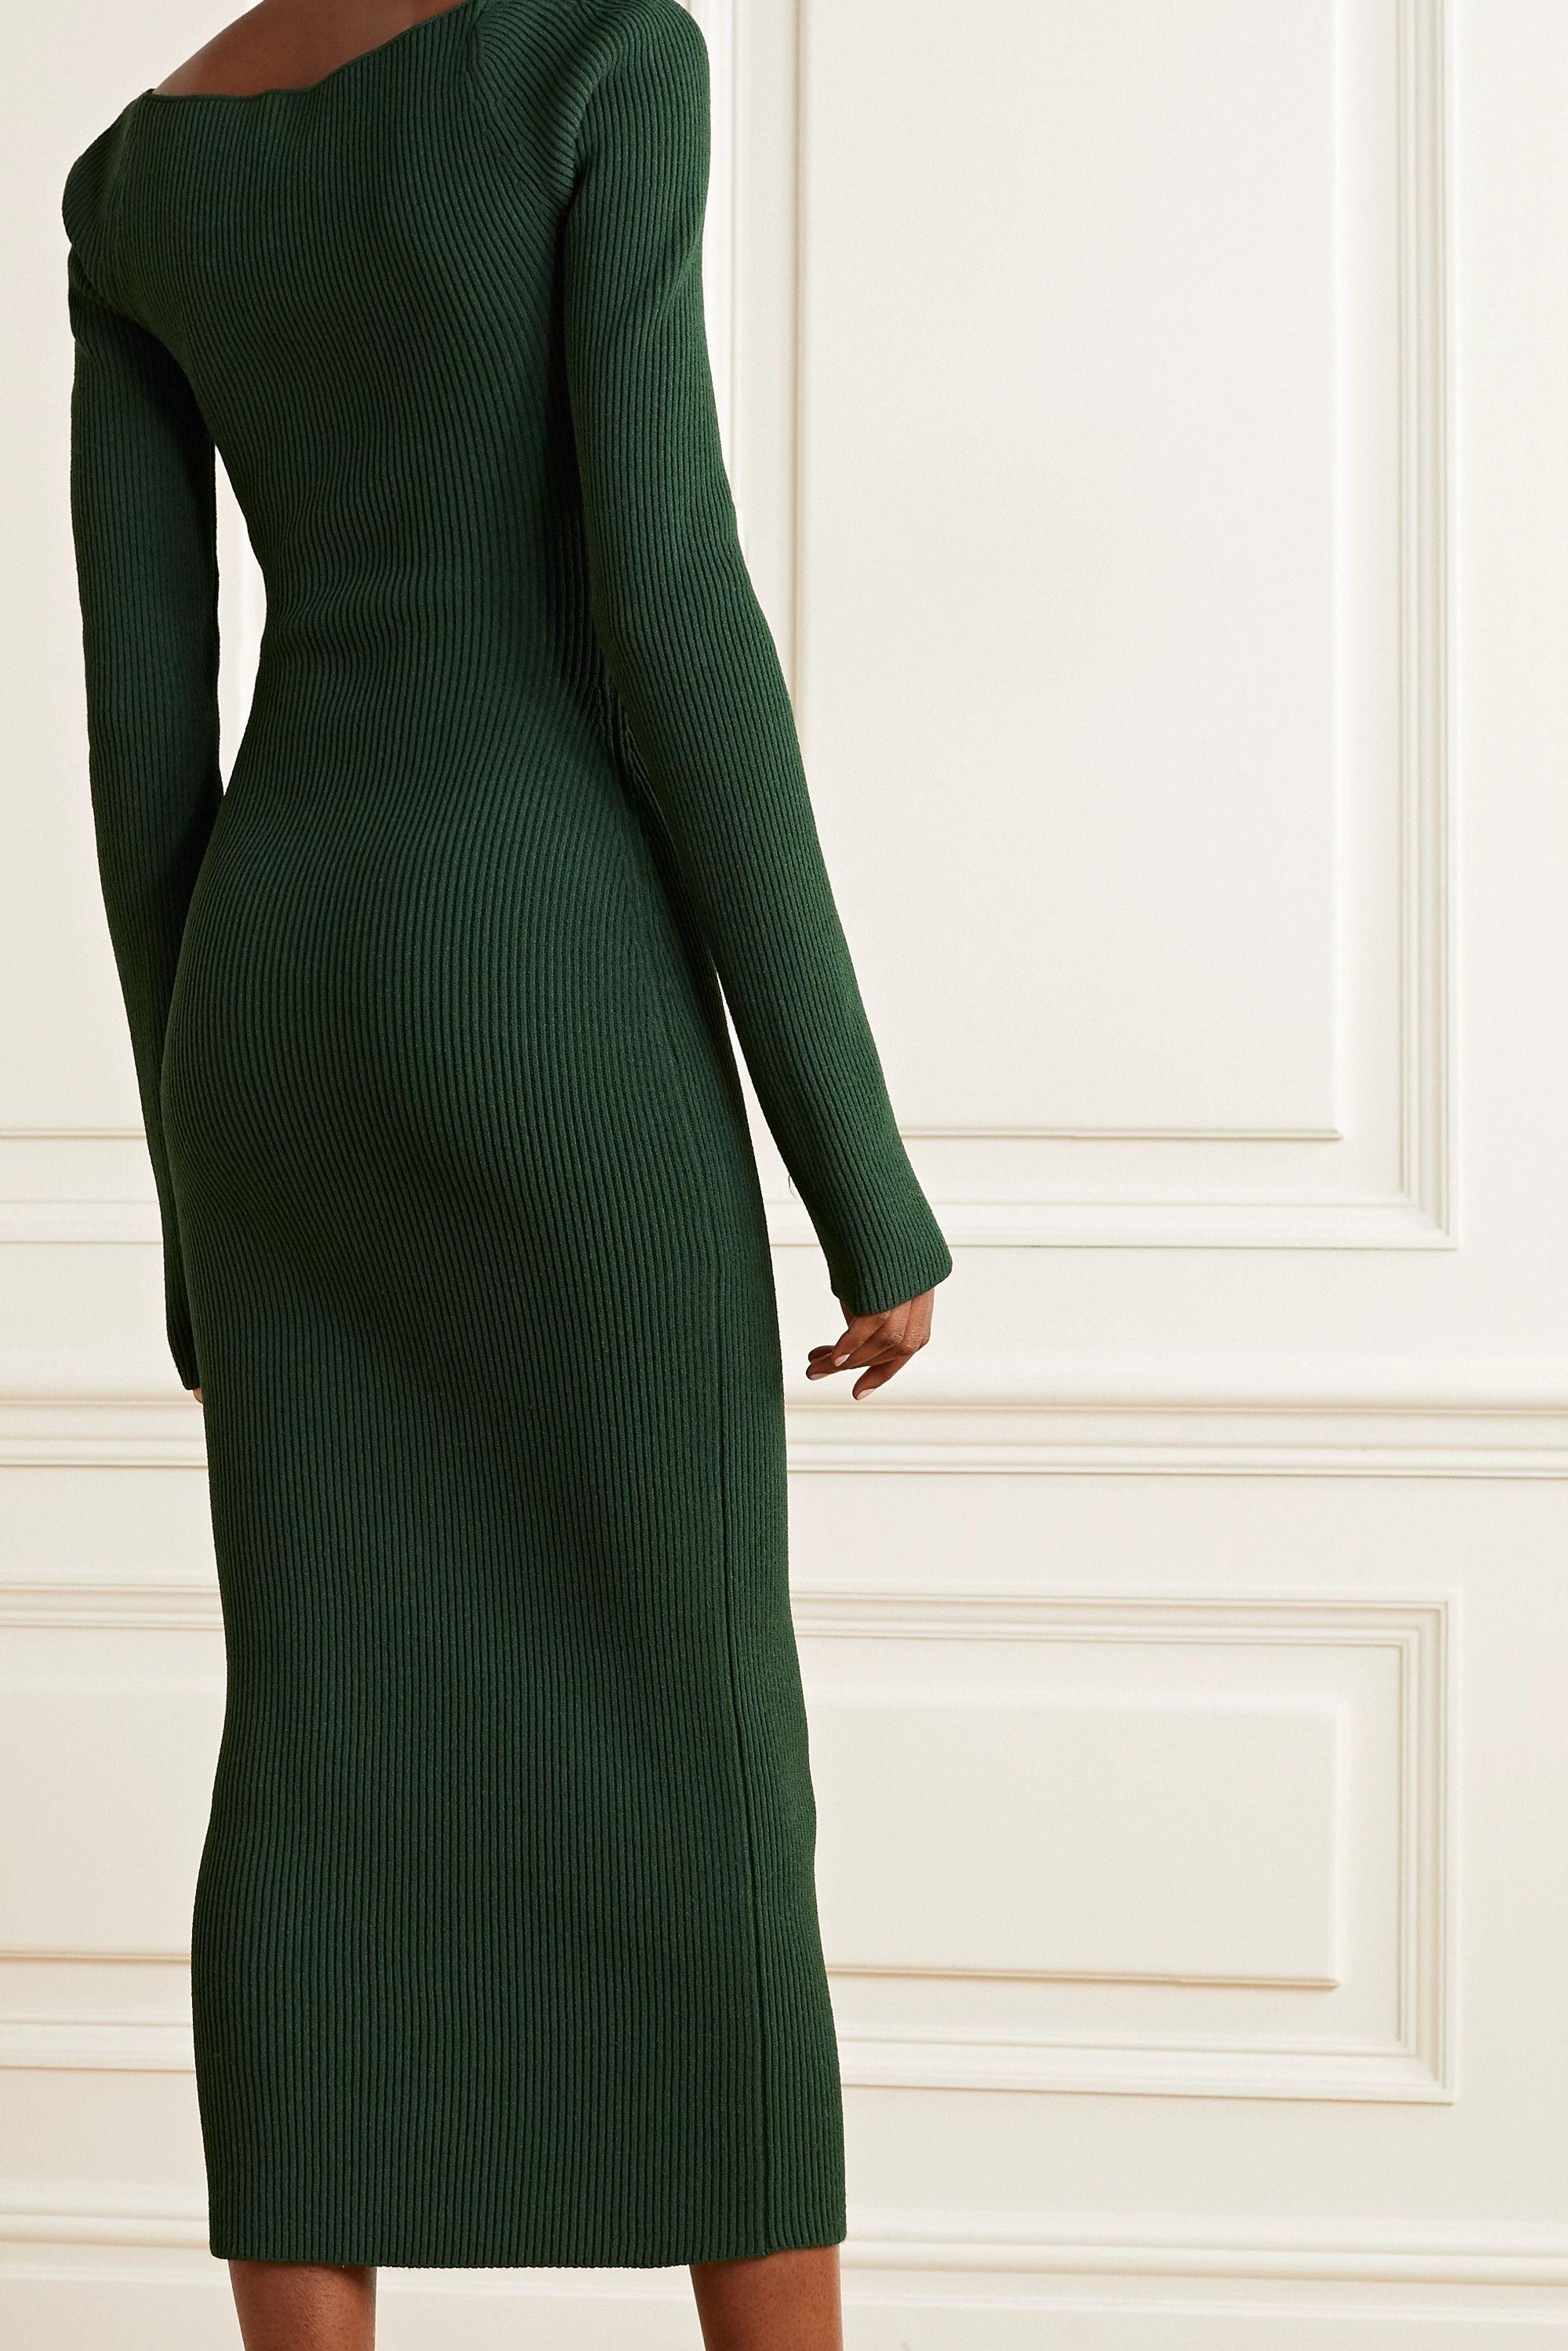 Green Beth Ribbed Knit Midi Dress Khaite In 2021 Knit Midi Dress Knit Midi Bodycon Dress Casual [ 2999 x 2000 Pixel ]